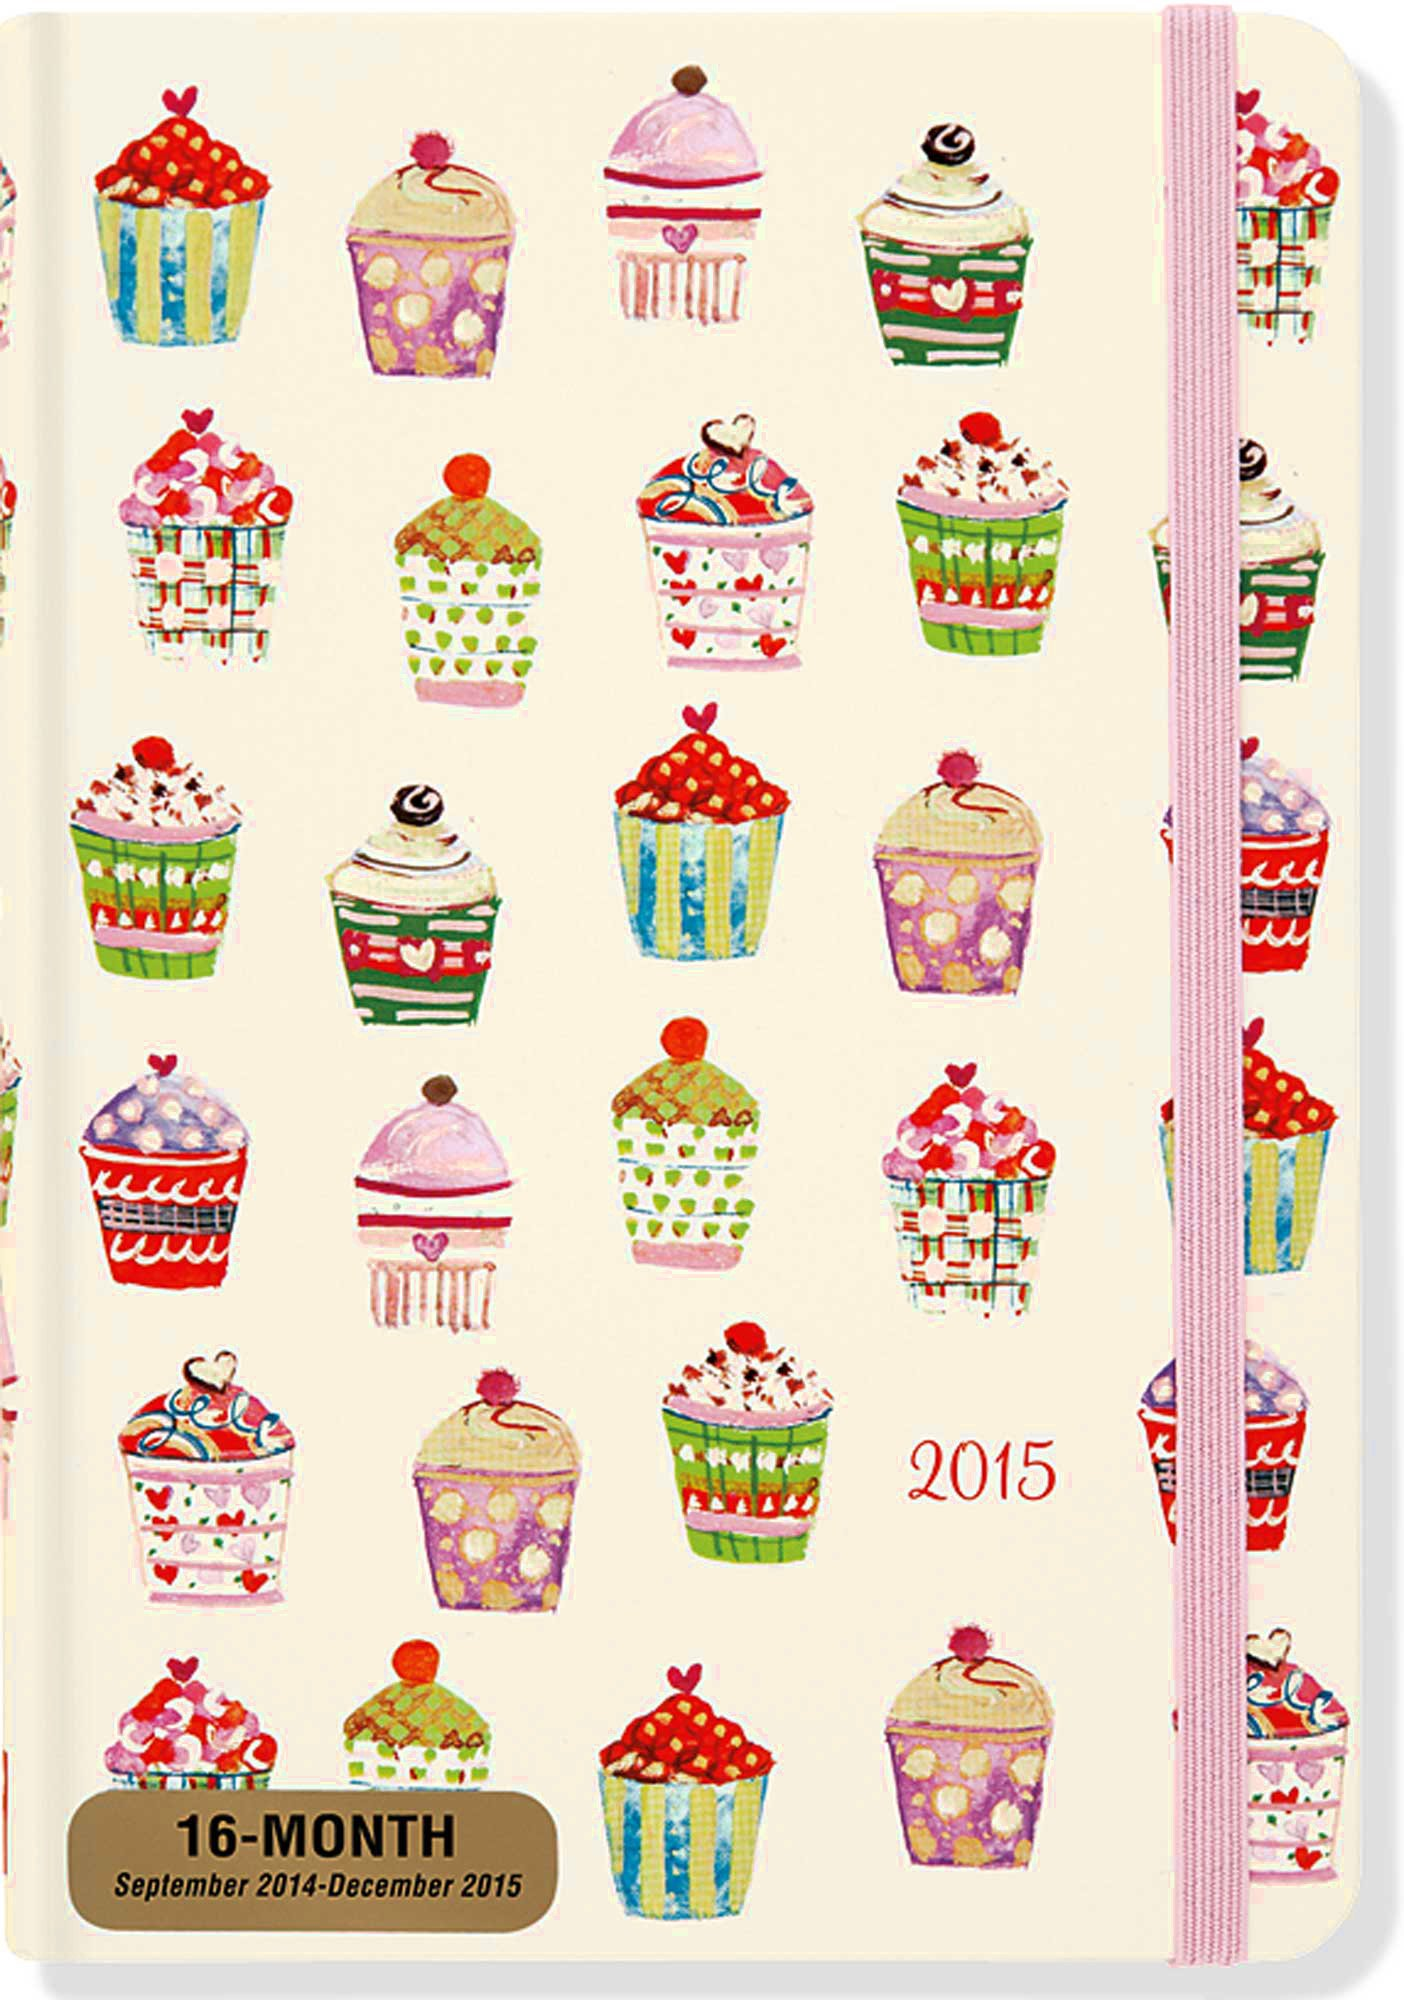 Cupcakes 2015 Calendar